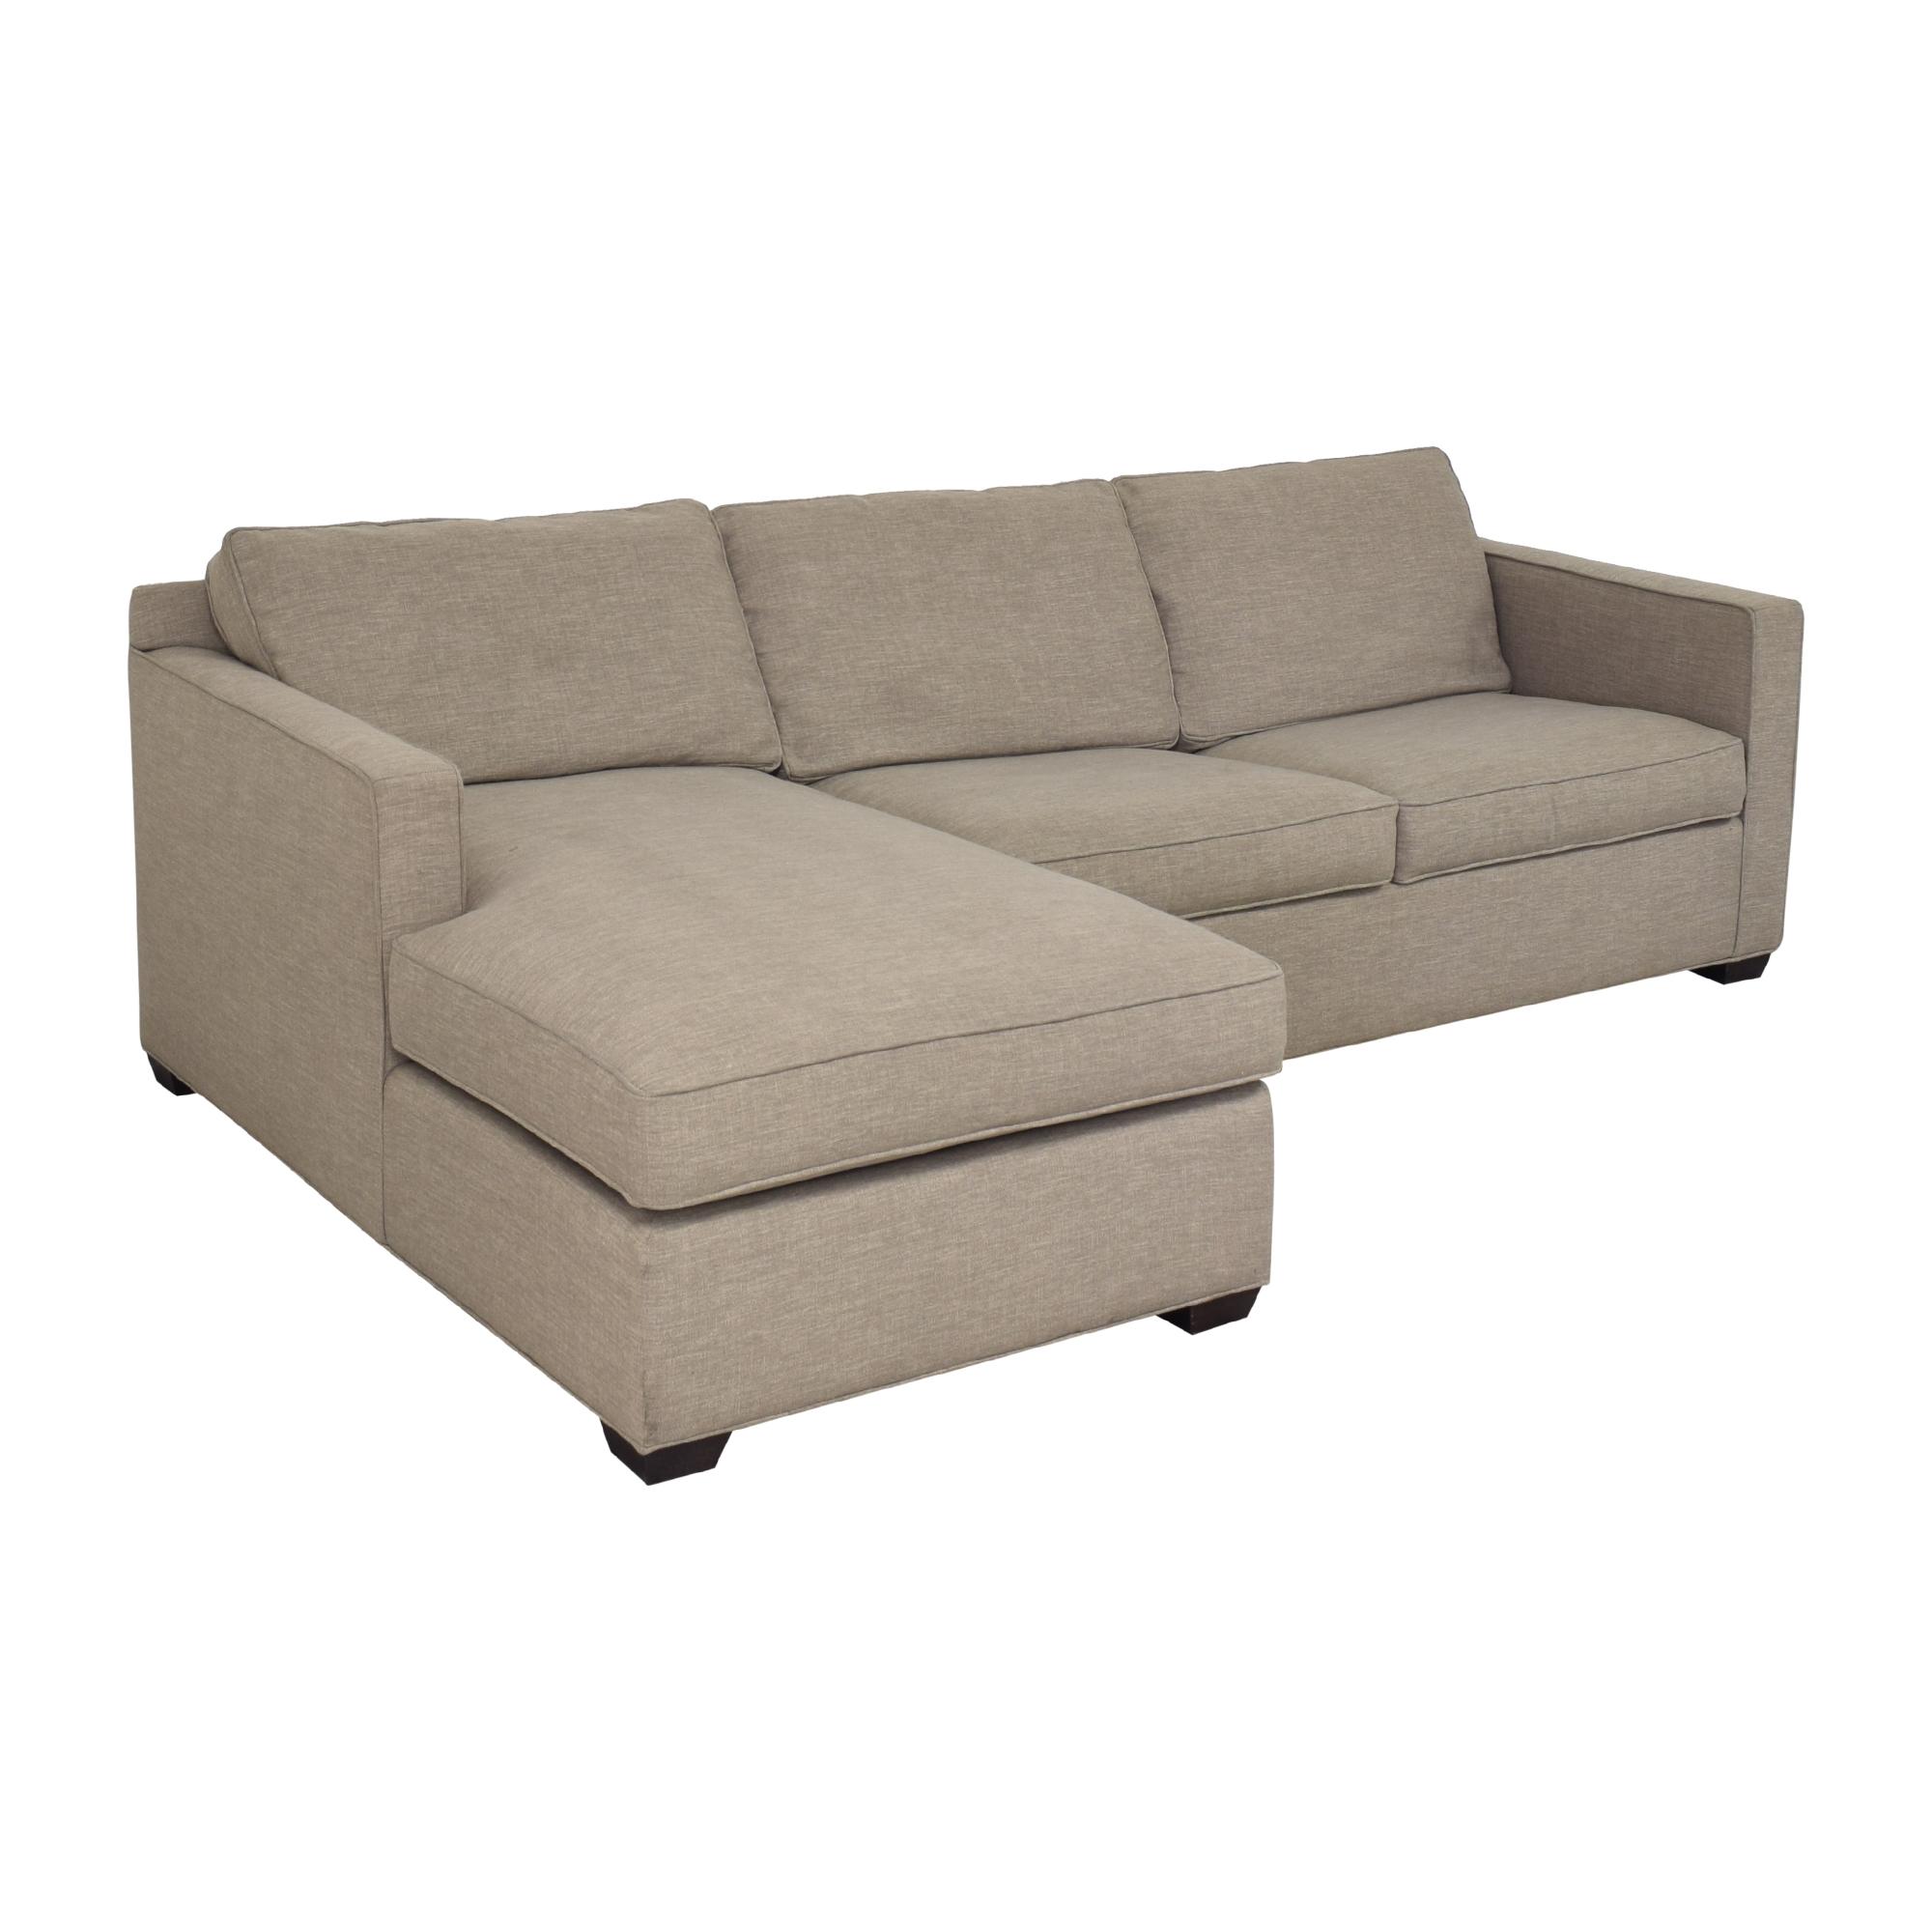 Crate & Barrel Davis Sleeper Sofa  sale